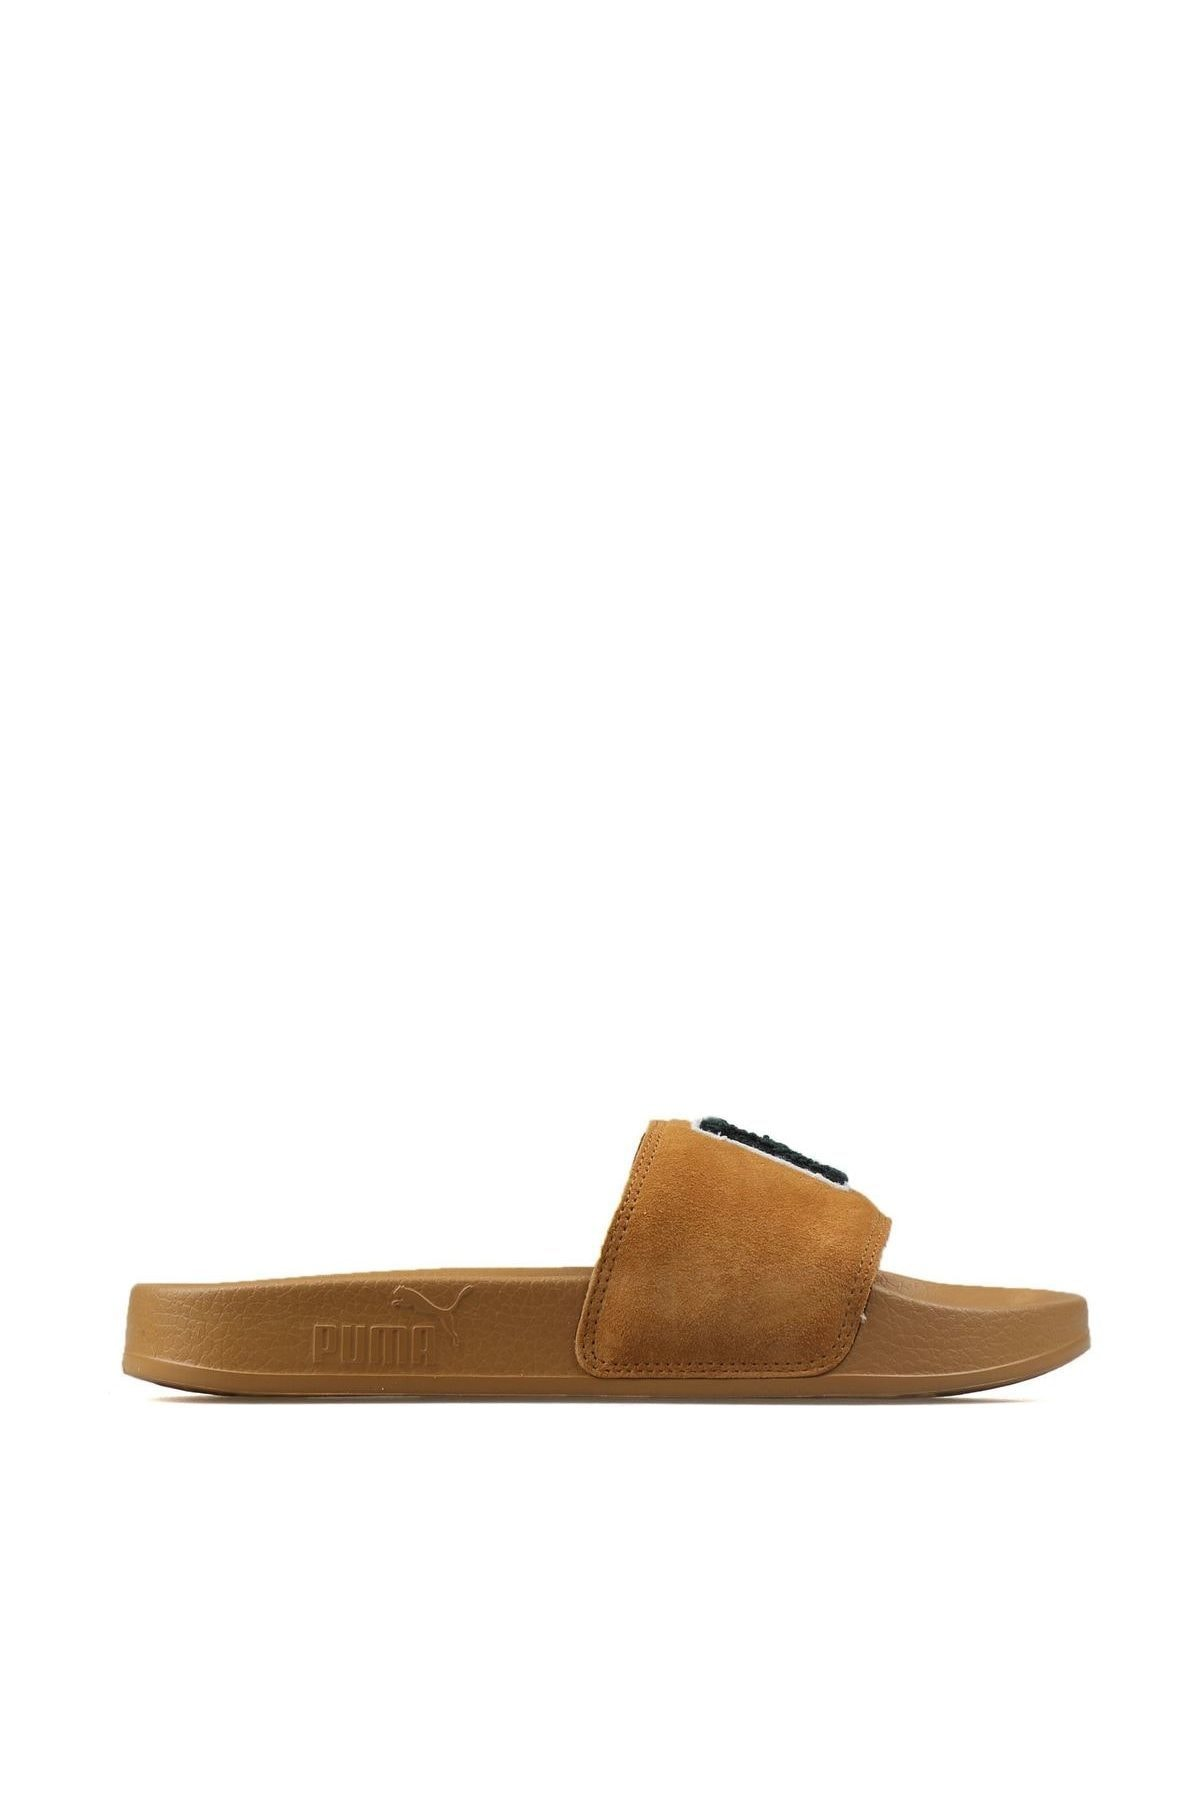 Puma Kadın Sneaker - 36708702 LeadFenty Fu - 36708702 1